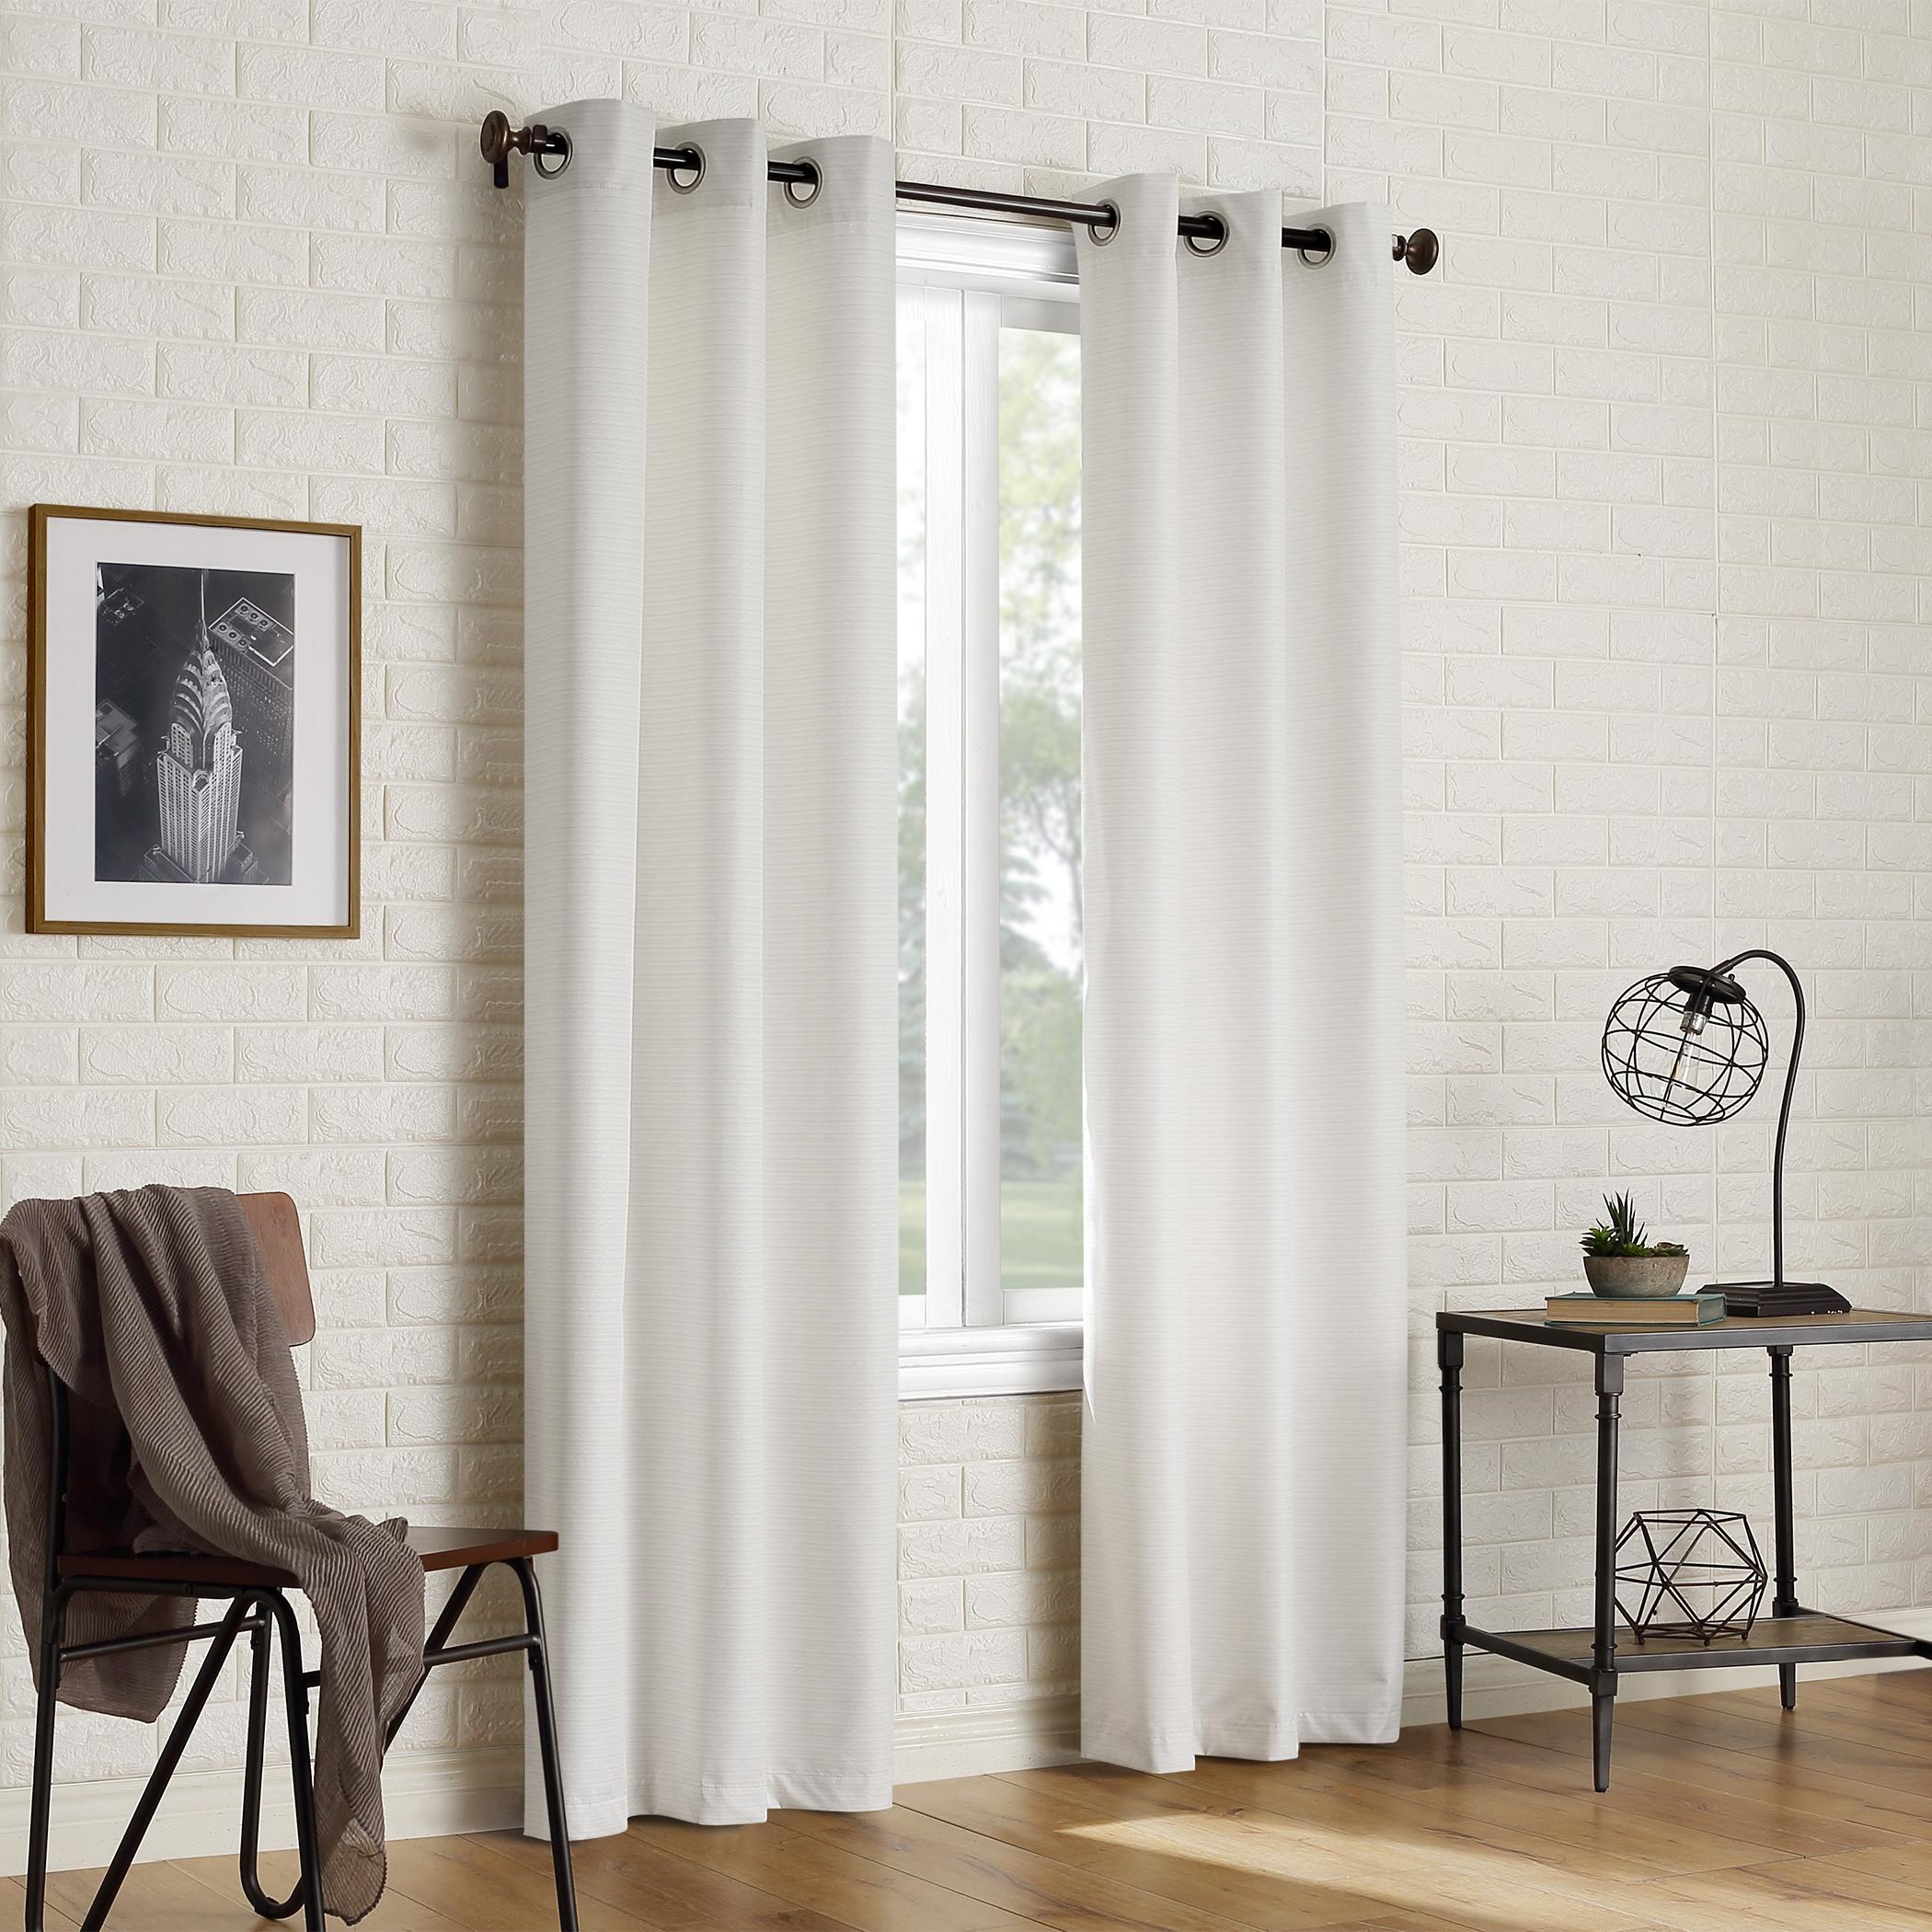 Sun Zero 2 Pack Arlo Textured Thermal Insulated Grommet Throughout Insulated Grommet Blackout Curtain Panel Pairs (View 17 of 20)